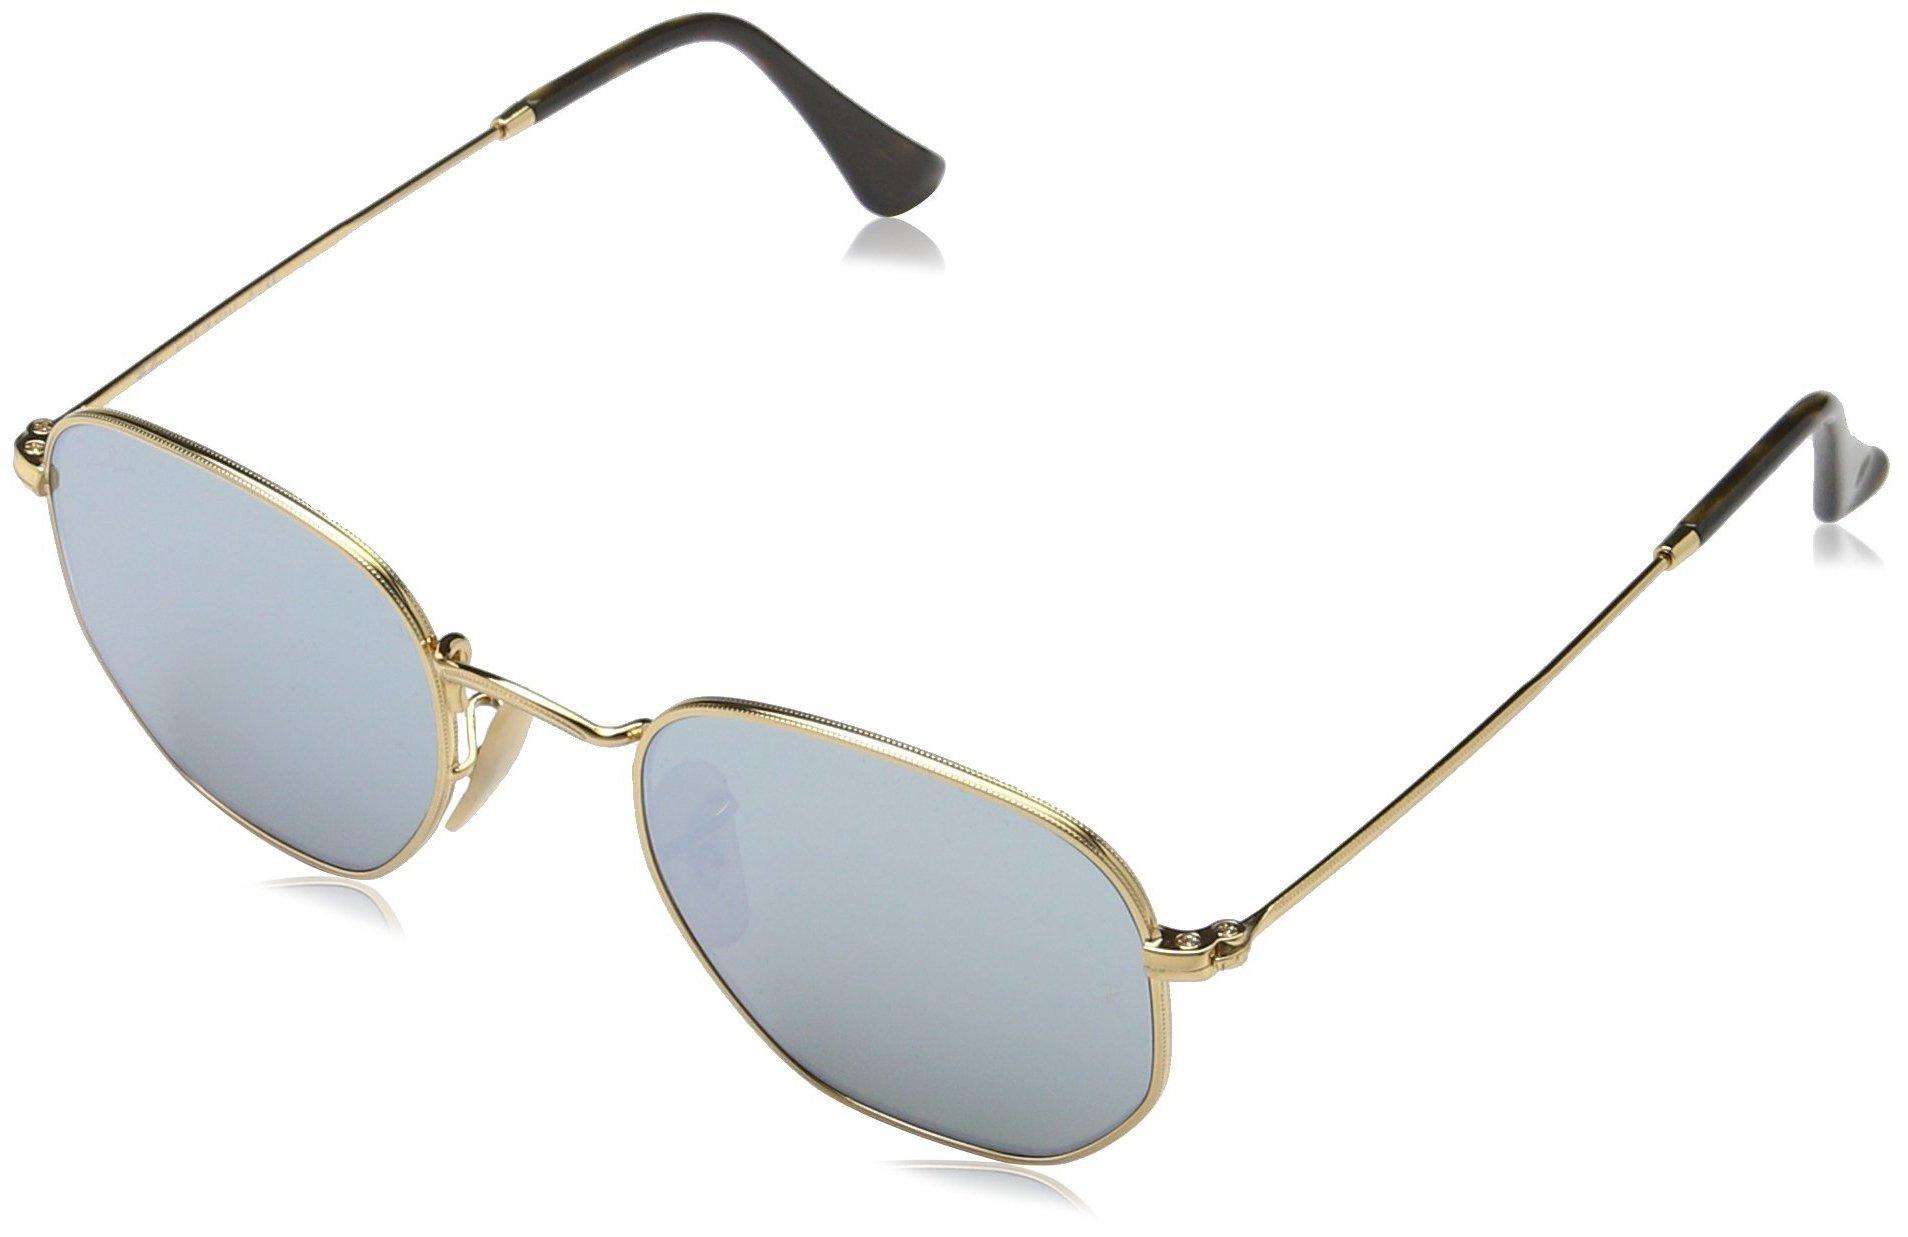 Ray-Ban Unisex RB3548N Hexagonal Sunglasses - Gold Frame Grey Flash Lenses, 48 mm